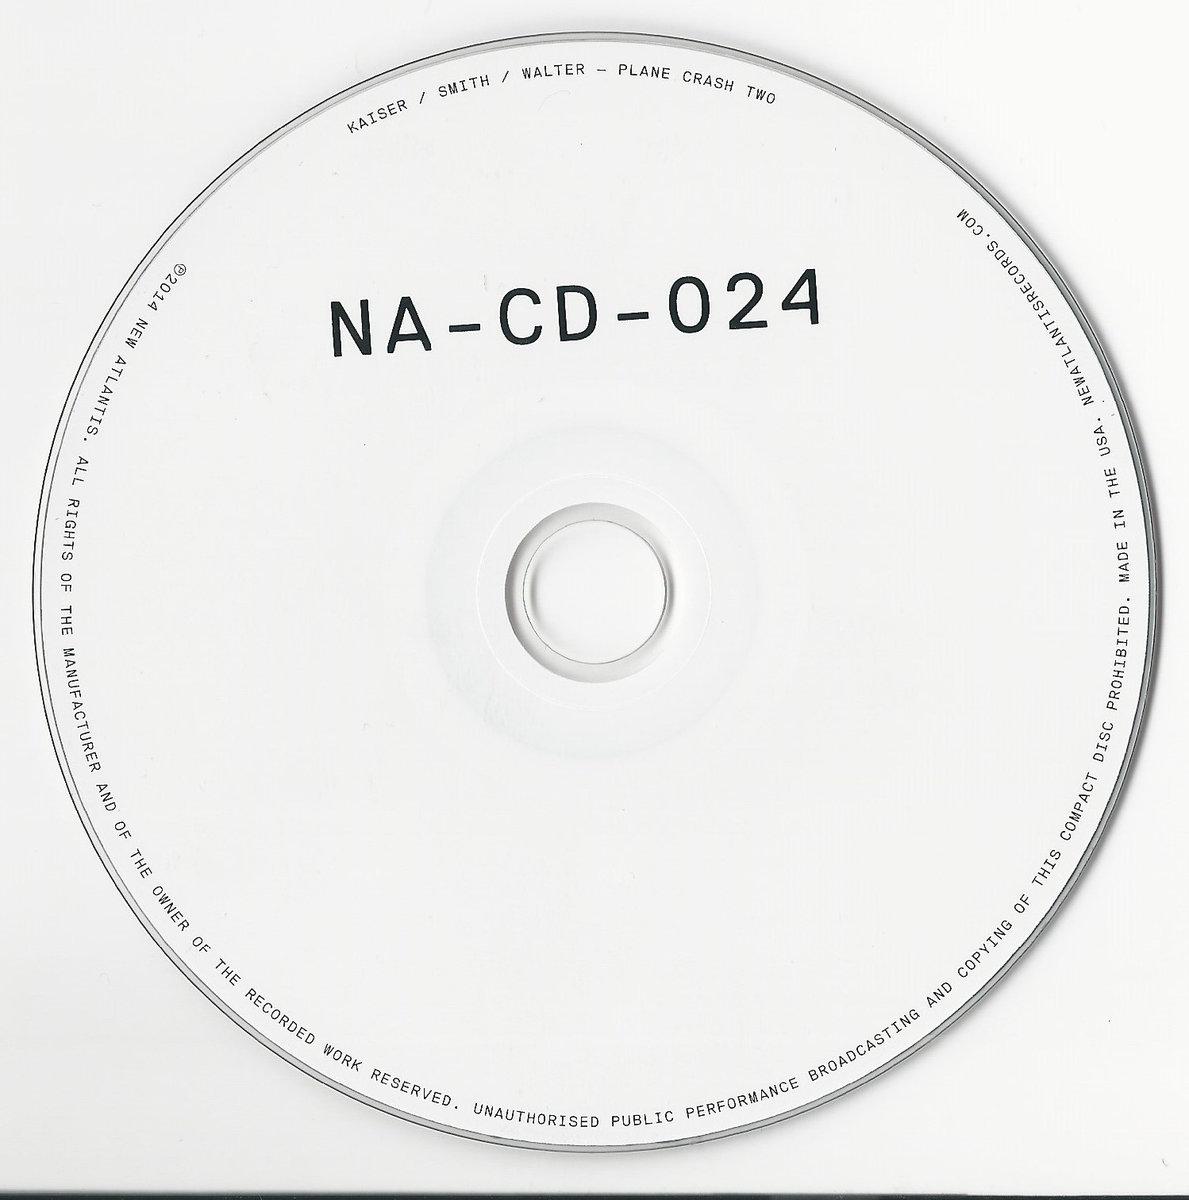 1189x1200 Plane Crash Two Na Cd 024 Balance Point Acoustics